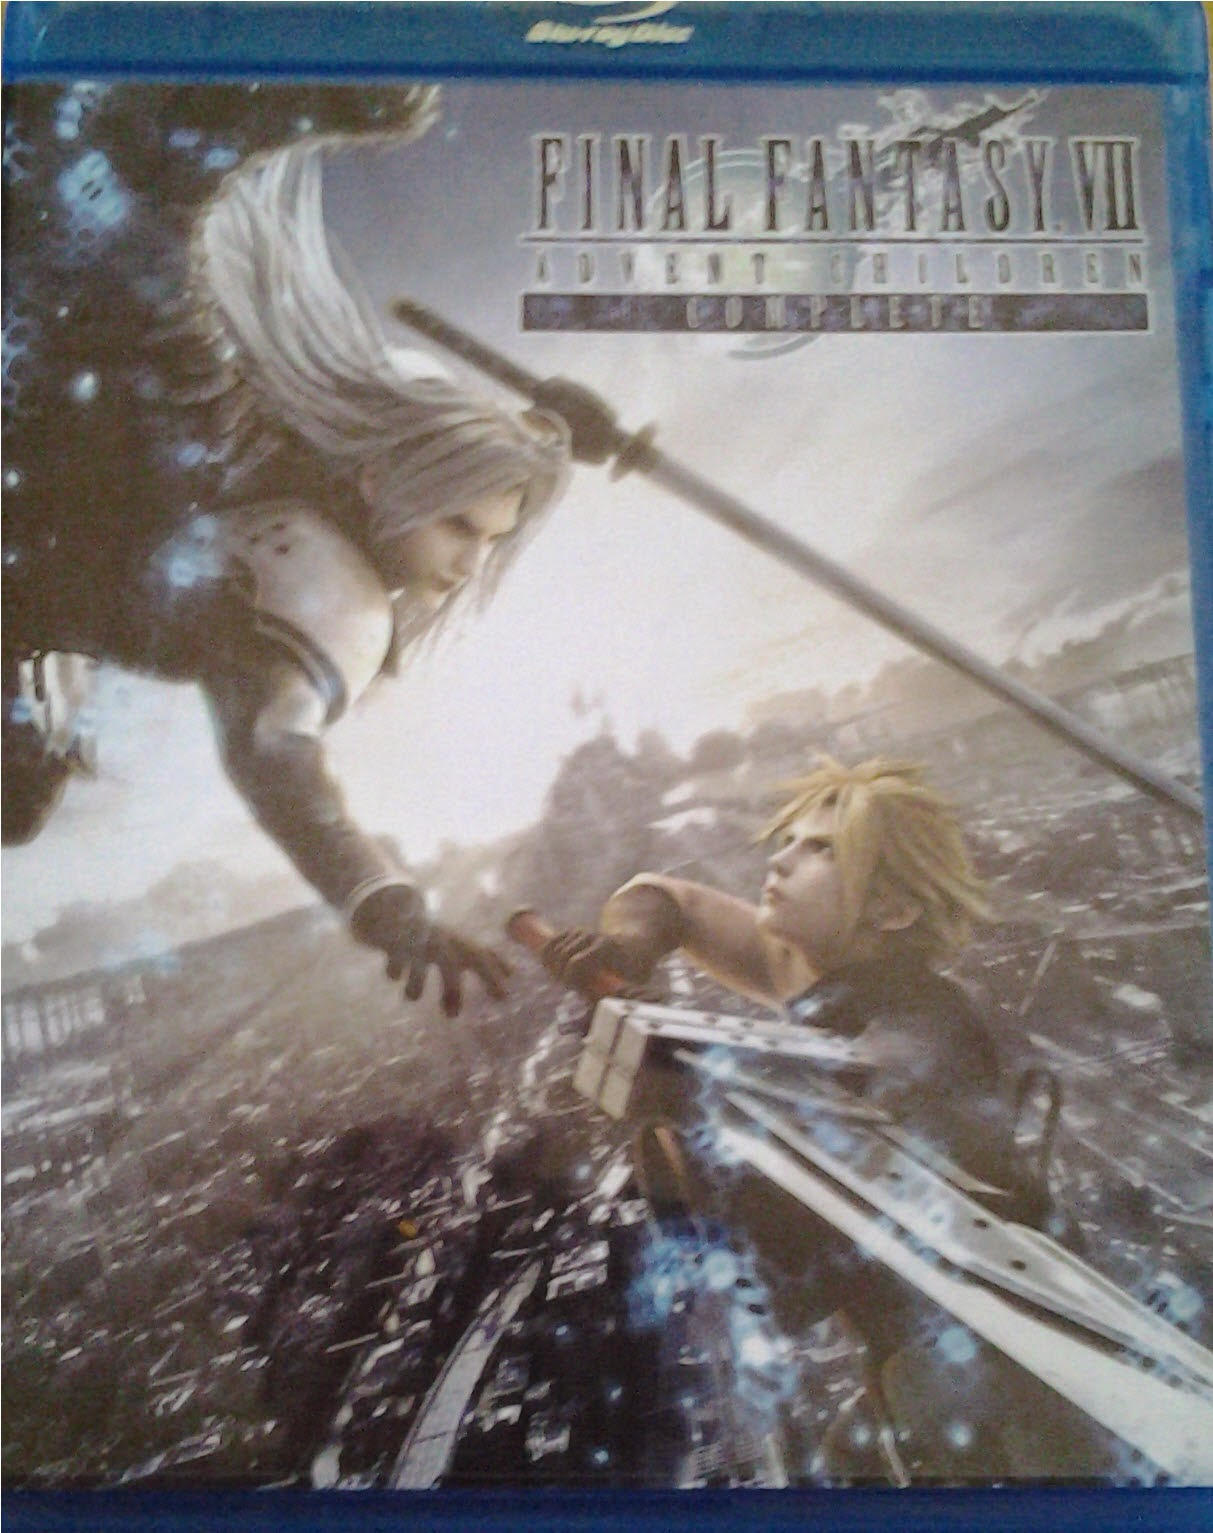 DVD Cover - Final Fantasy Advents Children